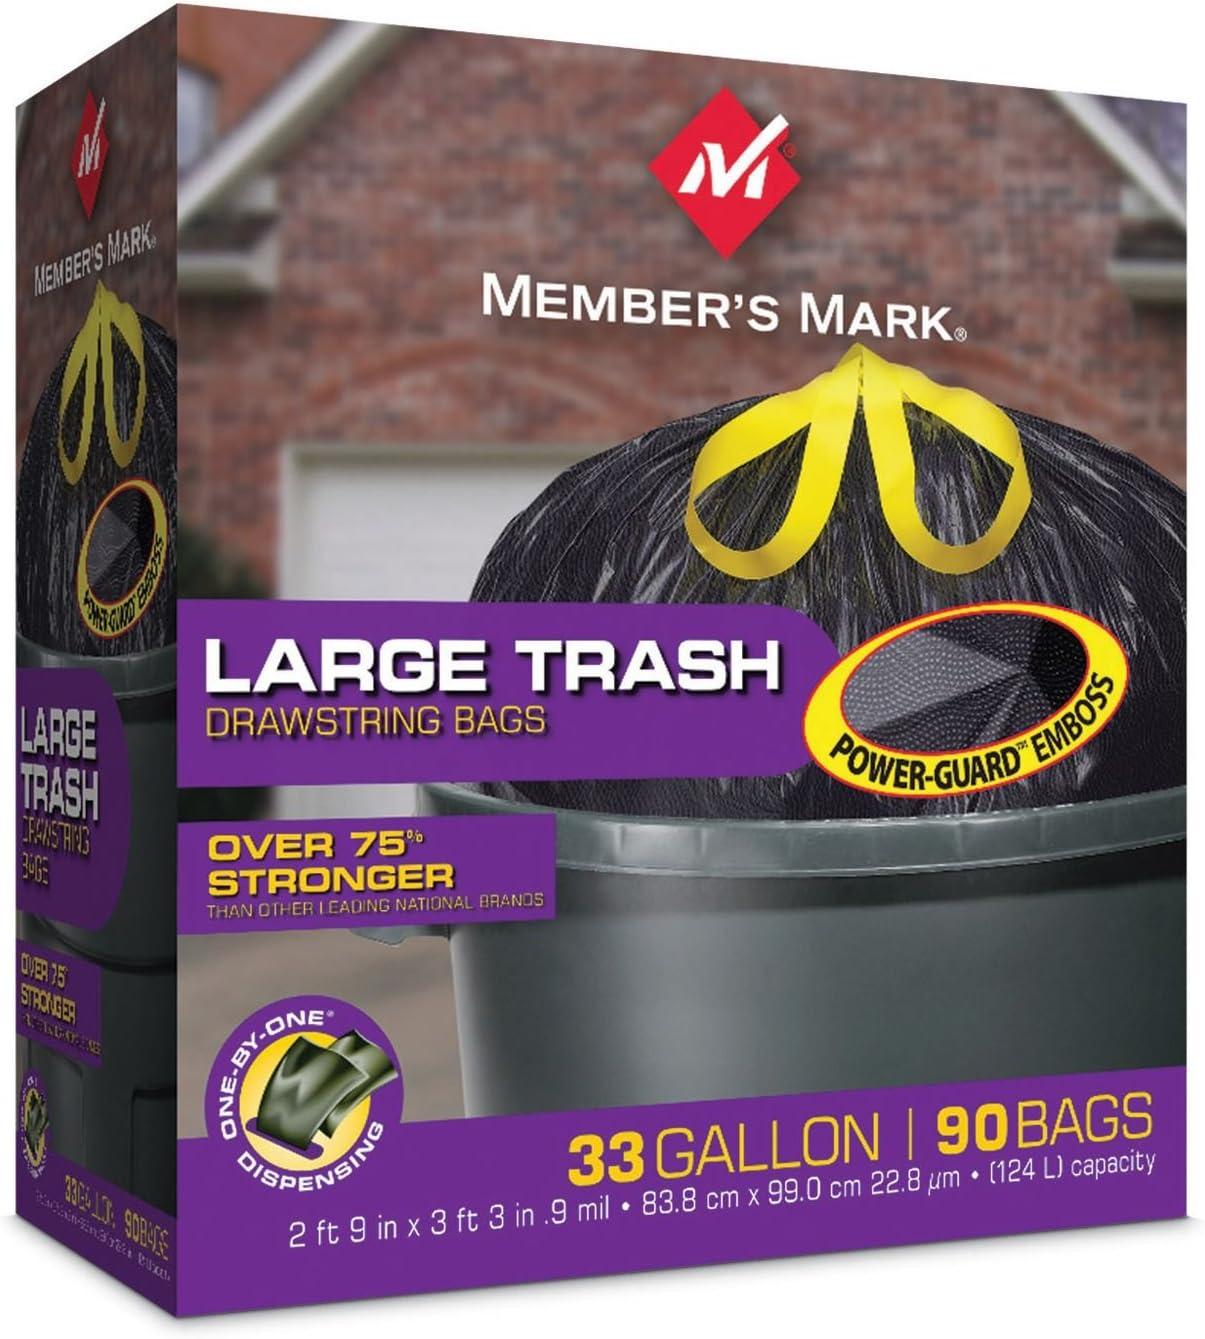 Member/'s Mark 39 Gallon Power-Guard Yard Drawstring Garbage Trash Bags 90 ct.